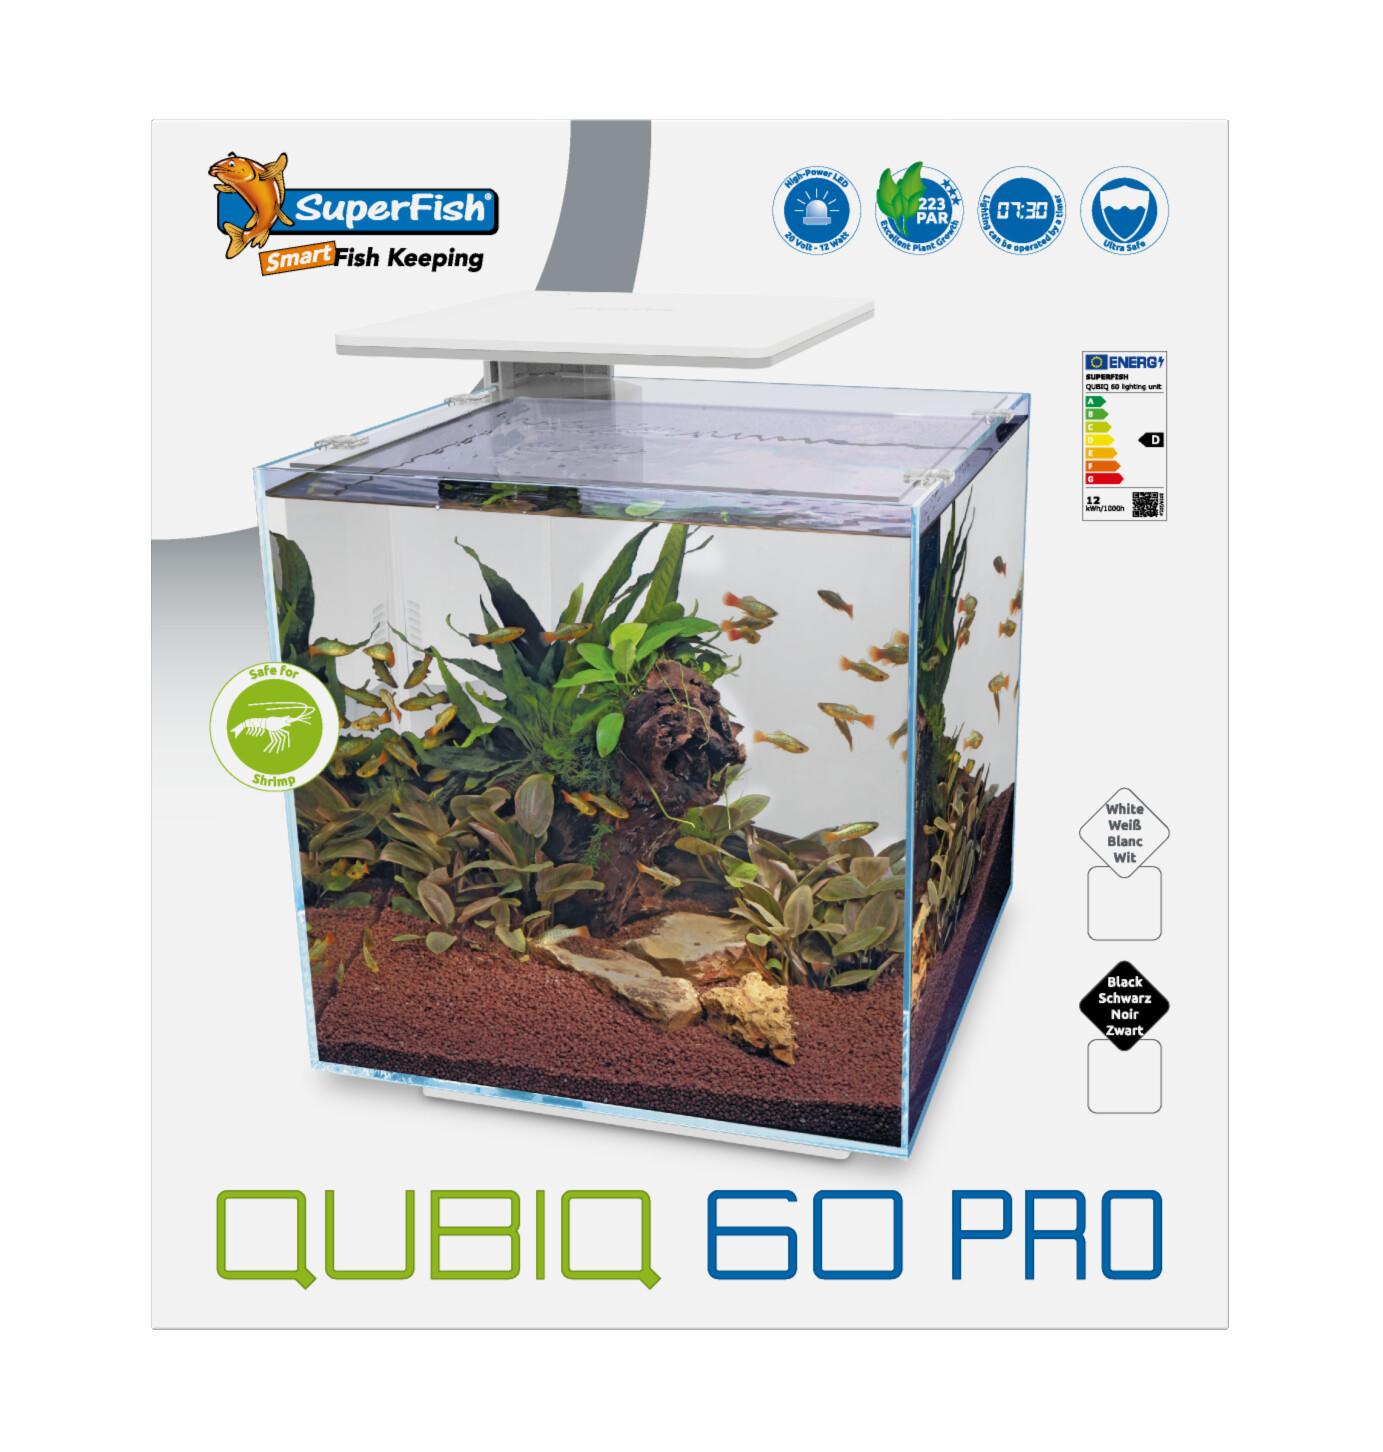 QUBIQ 60 PRO ZWART